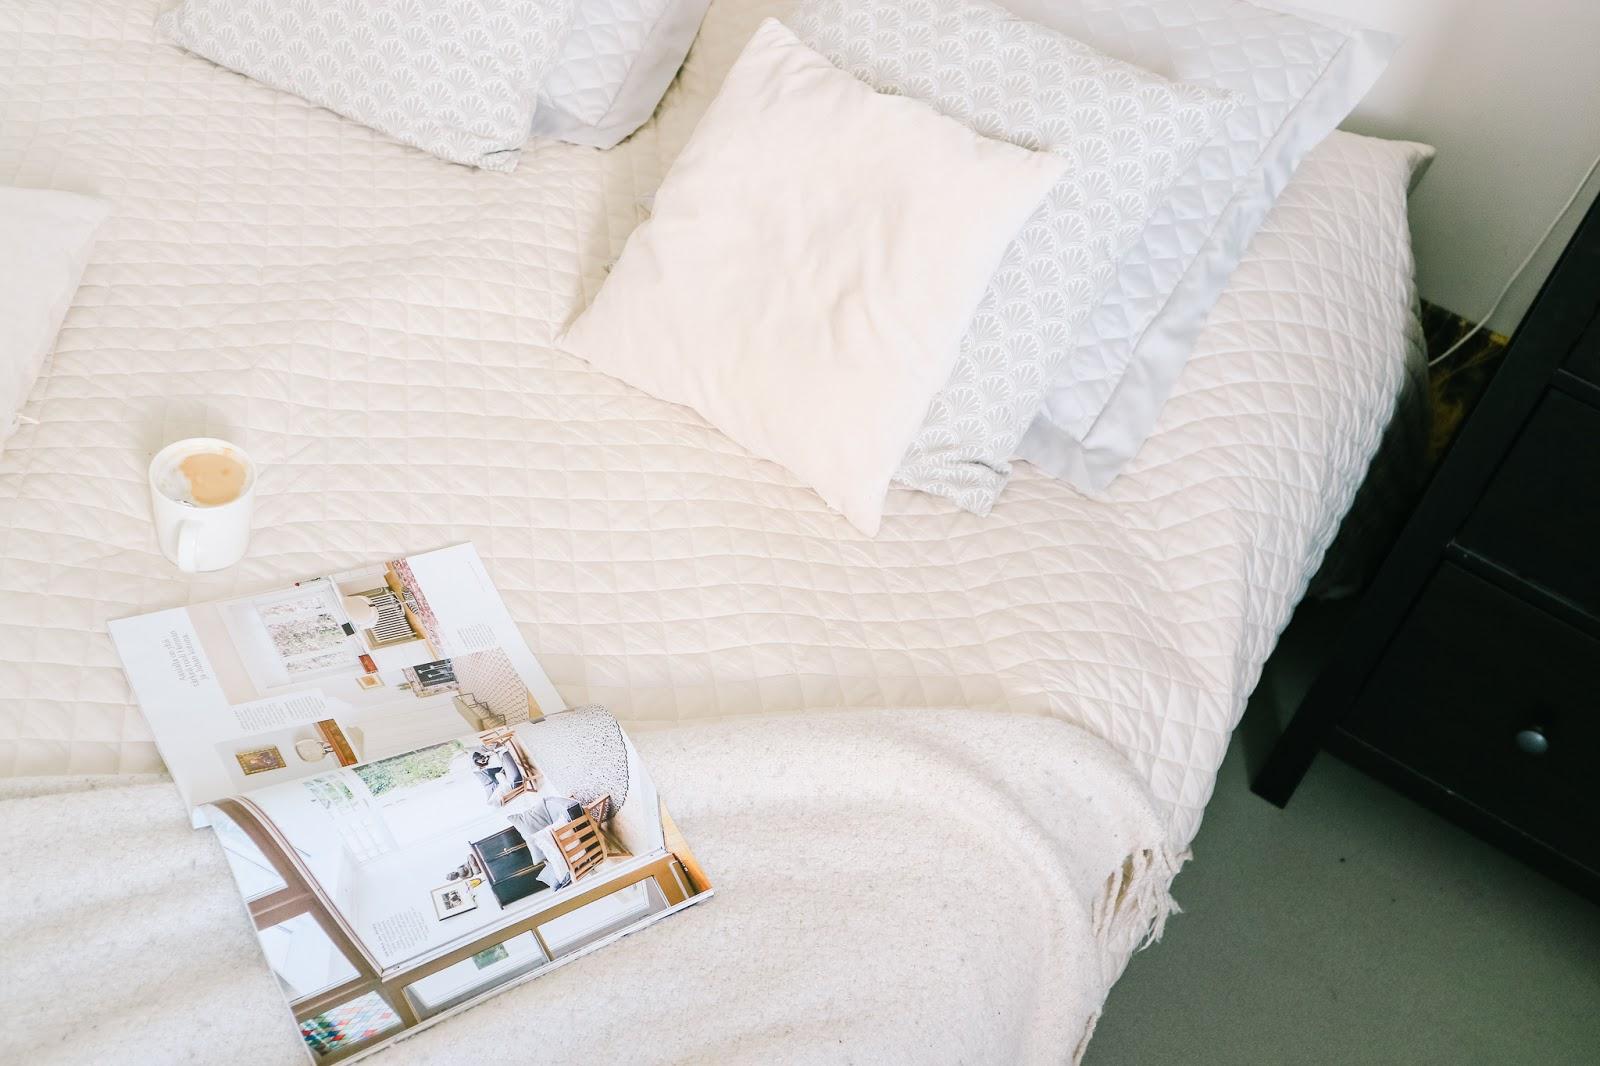 Big mamas home by Jenni S. Päivän paras tapa sängyn petaaminen